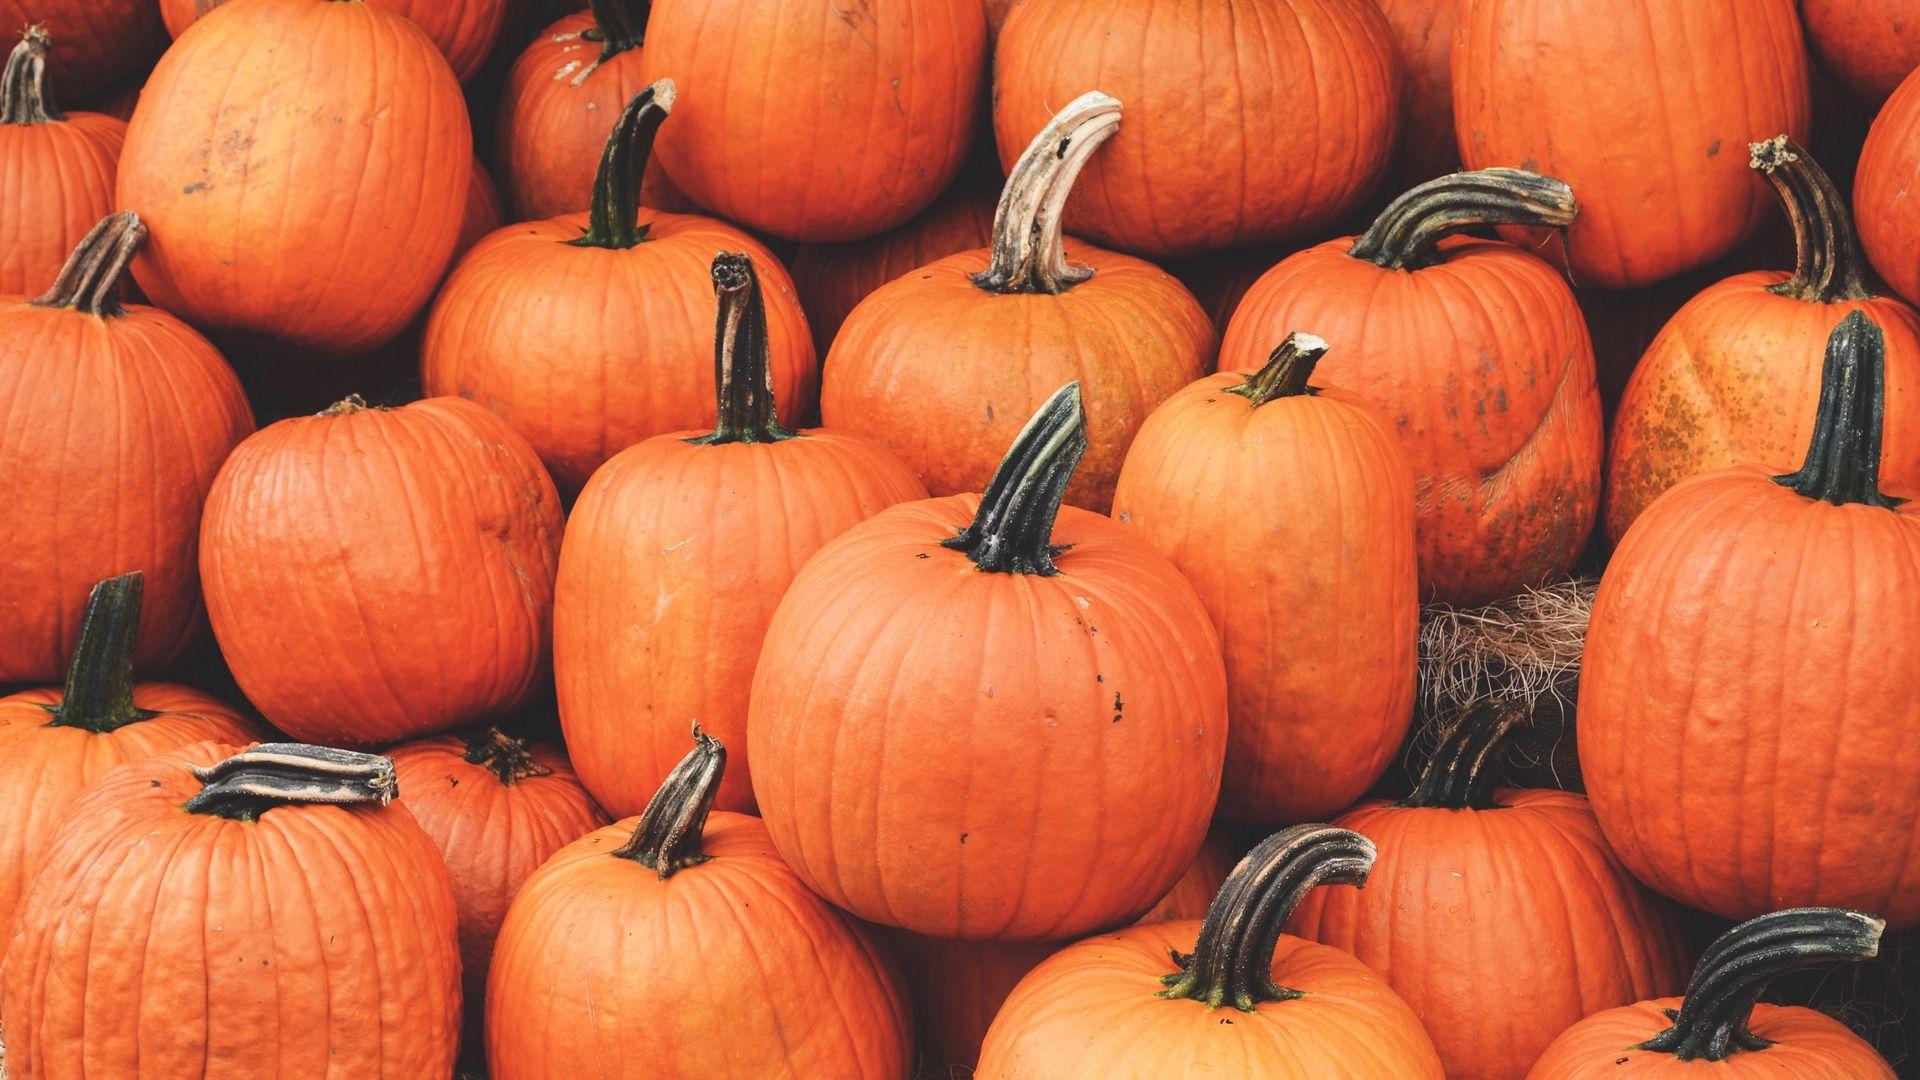 1920x1080 Wallpaper pumpkin, harvest, autumn, ripe